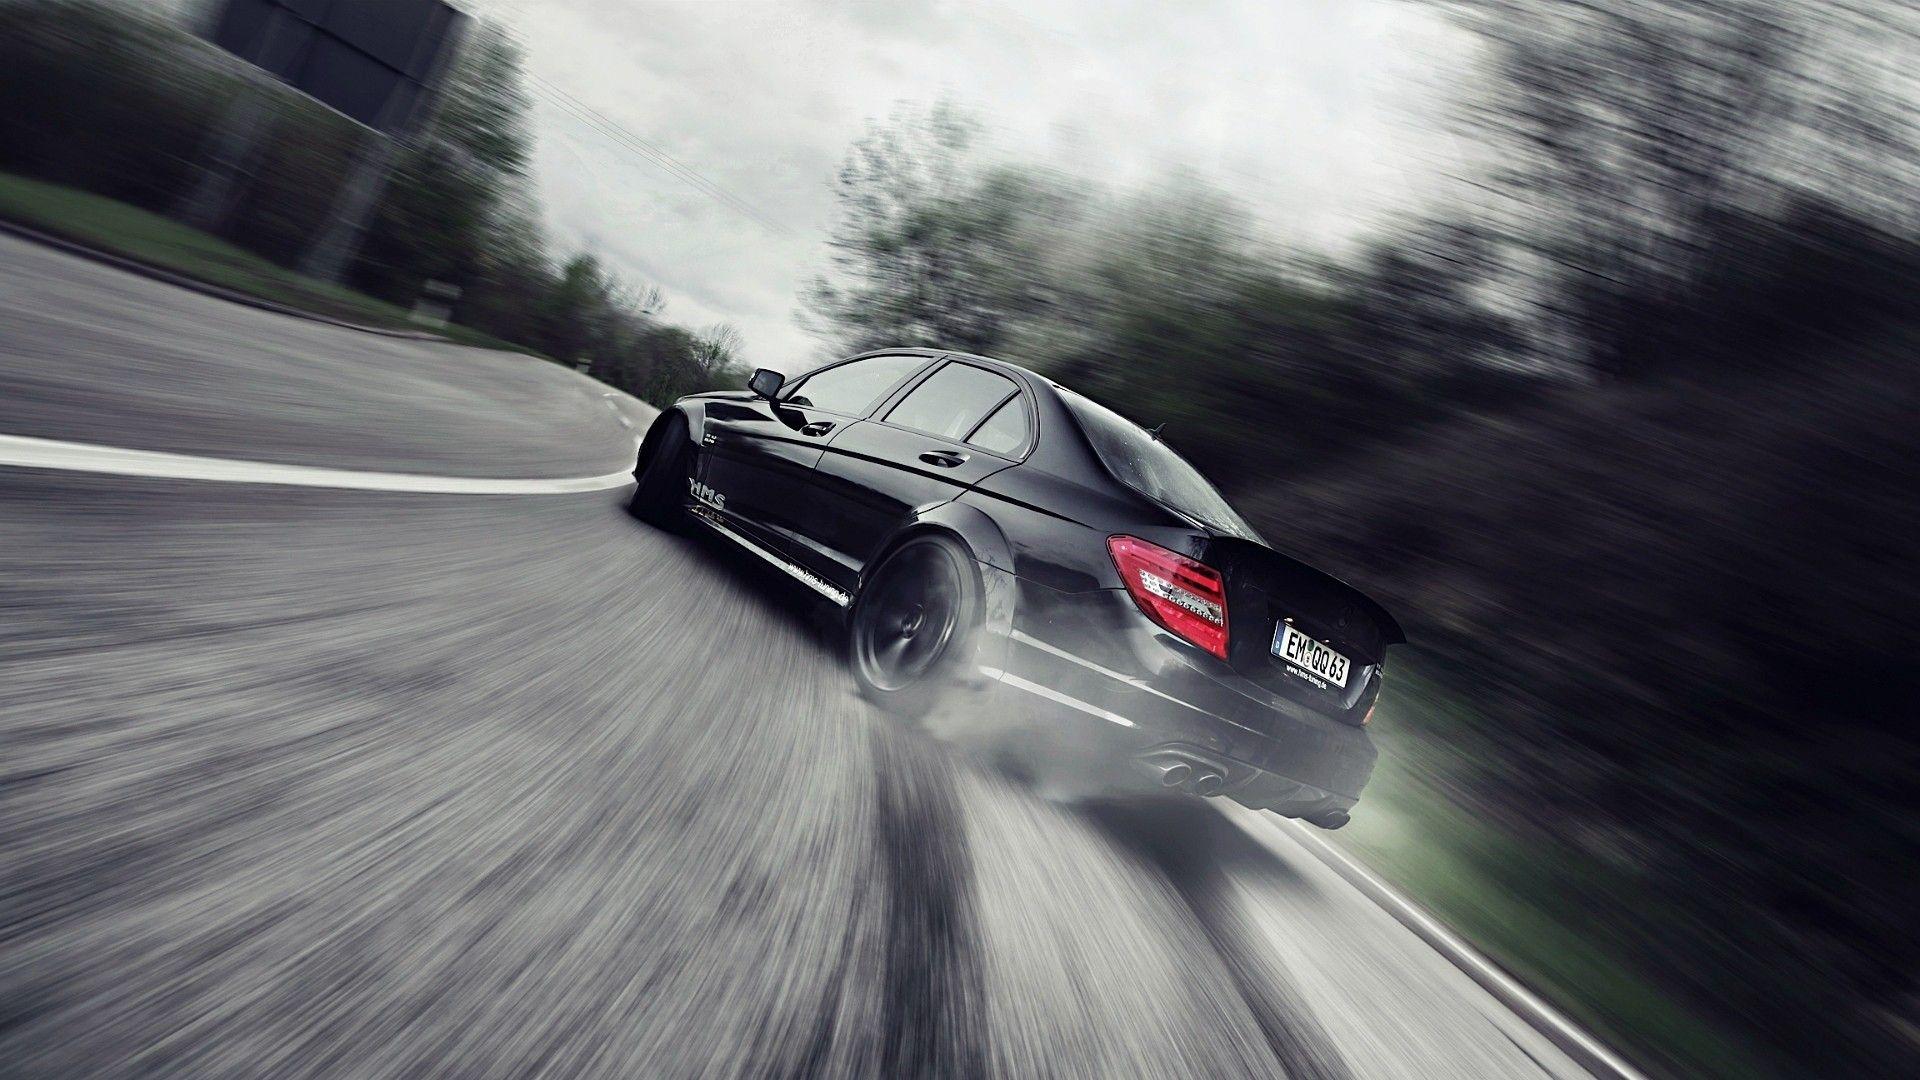 black series drift mercedes benz c63 amg 1920x1080 wallpaper - Mercedes Benz C63 Amg Black Series Wallpaper